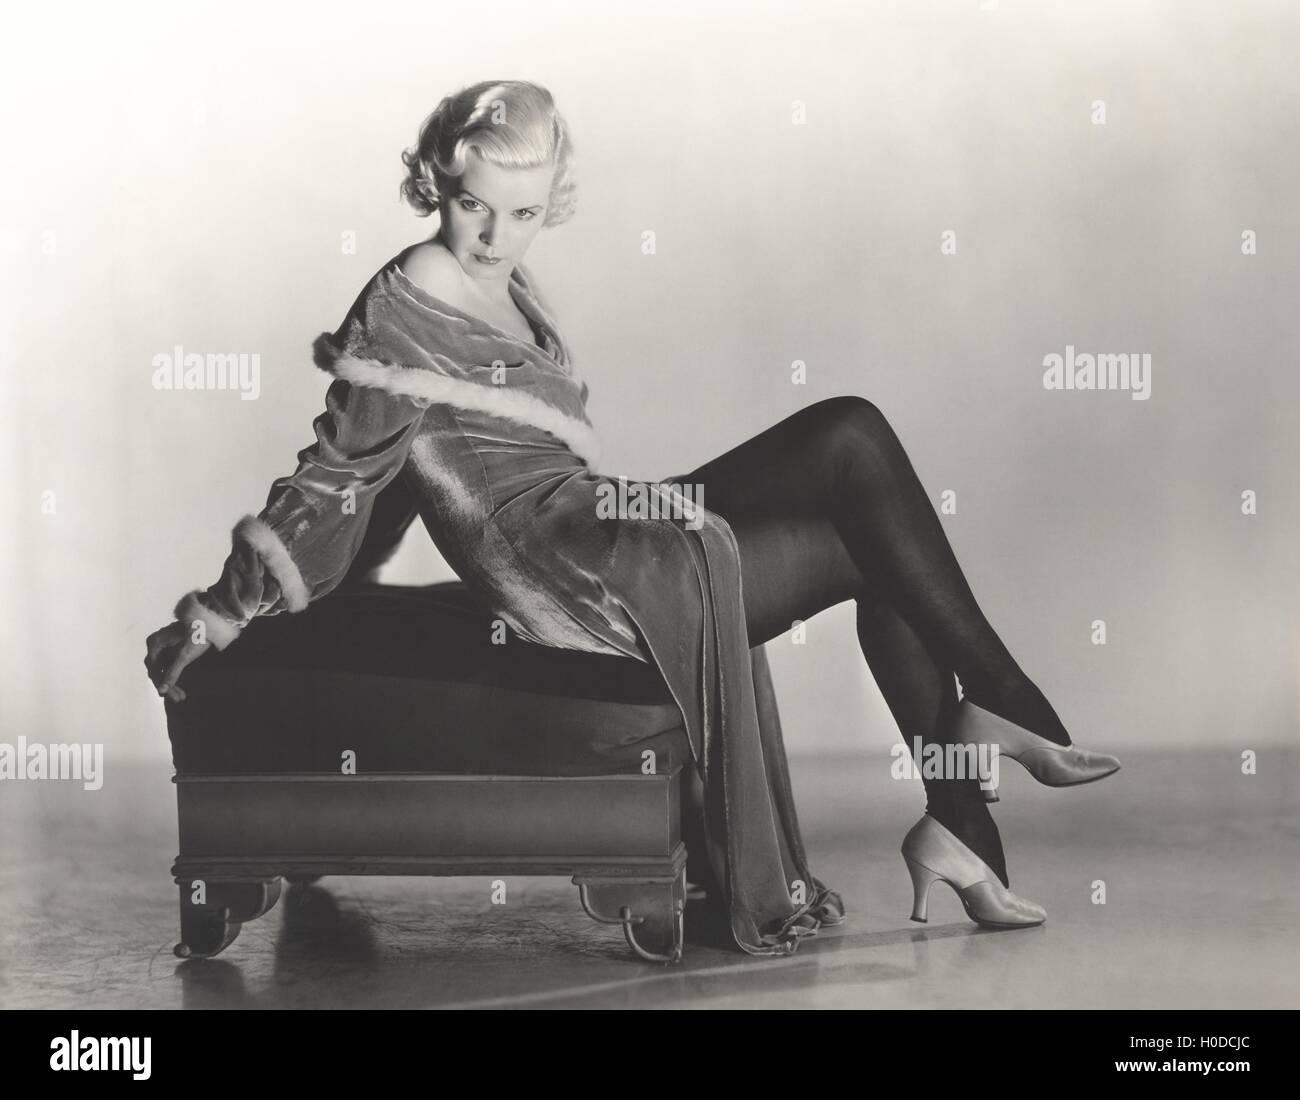 Woman in velvet dress sitting on footstool - Stock Image